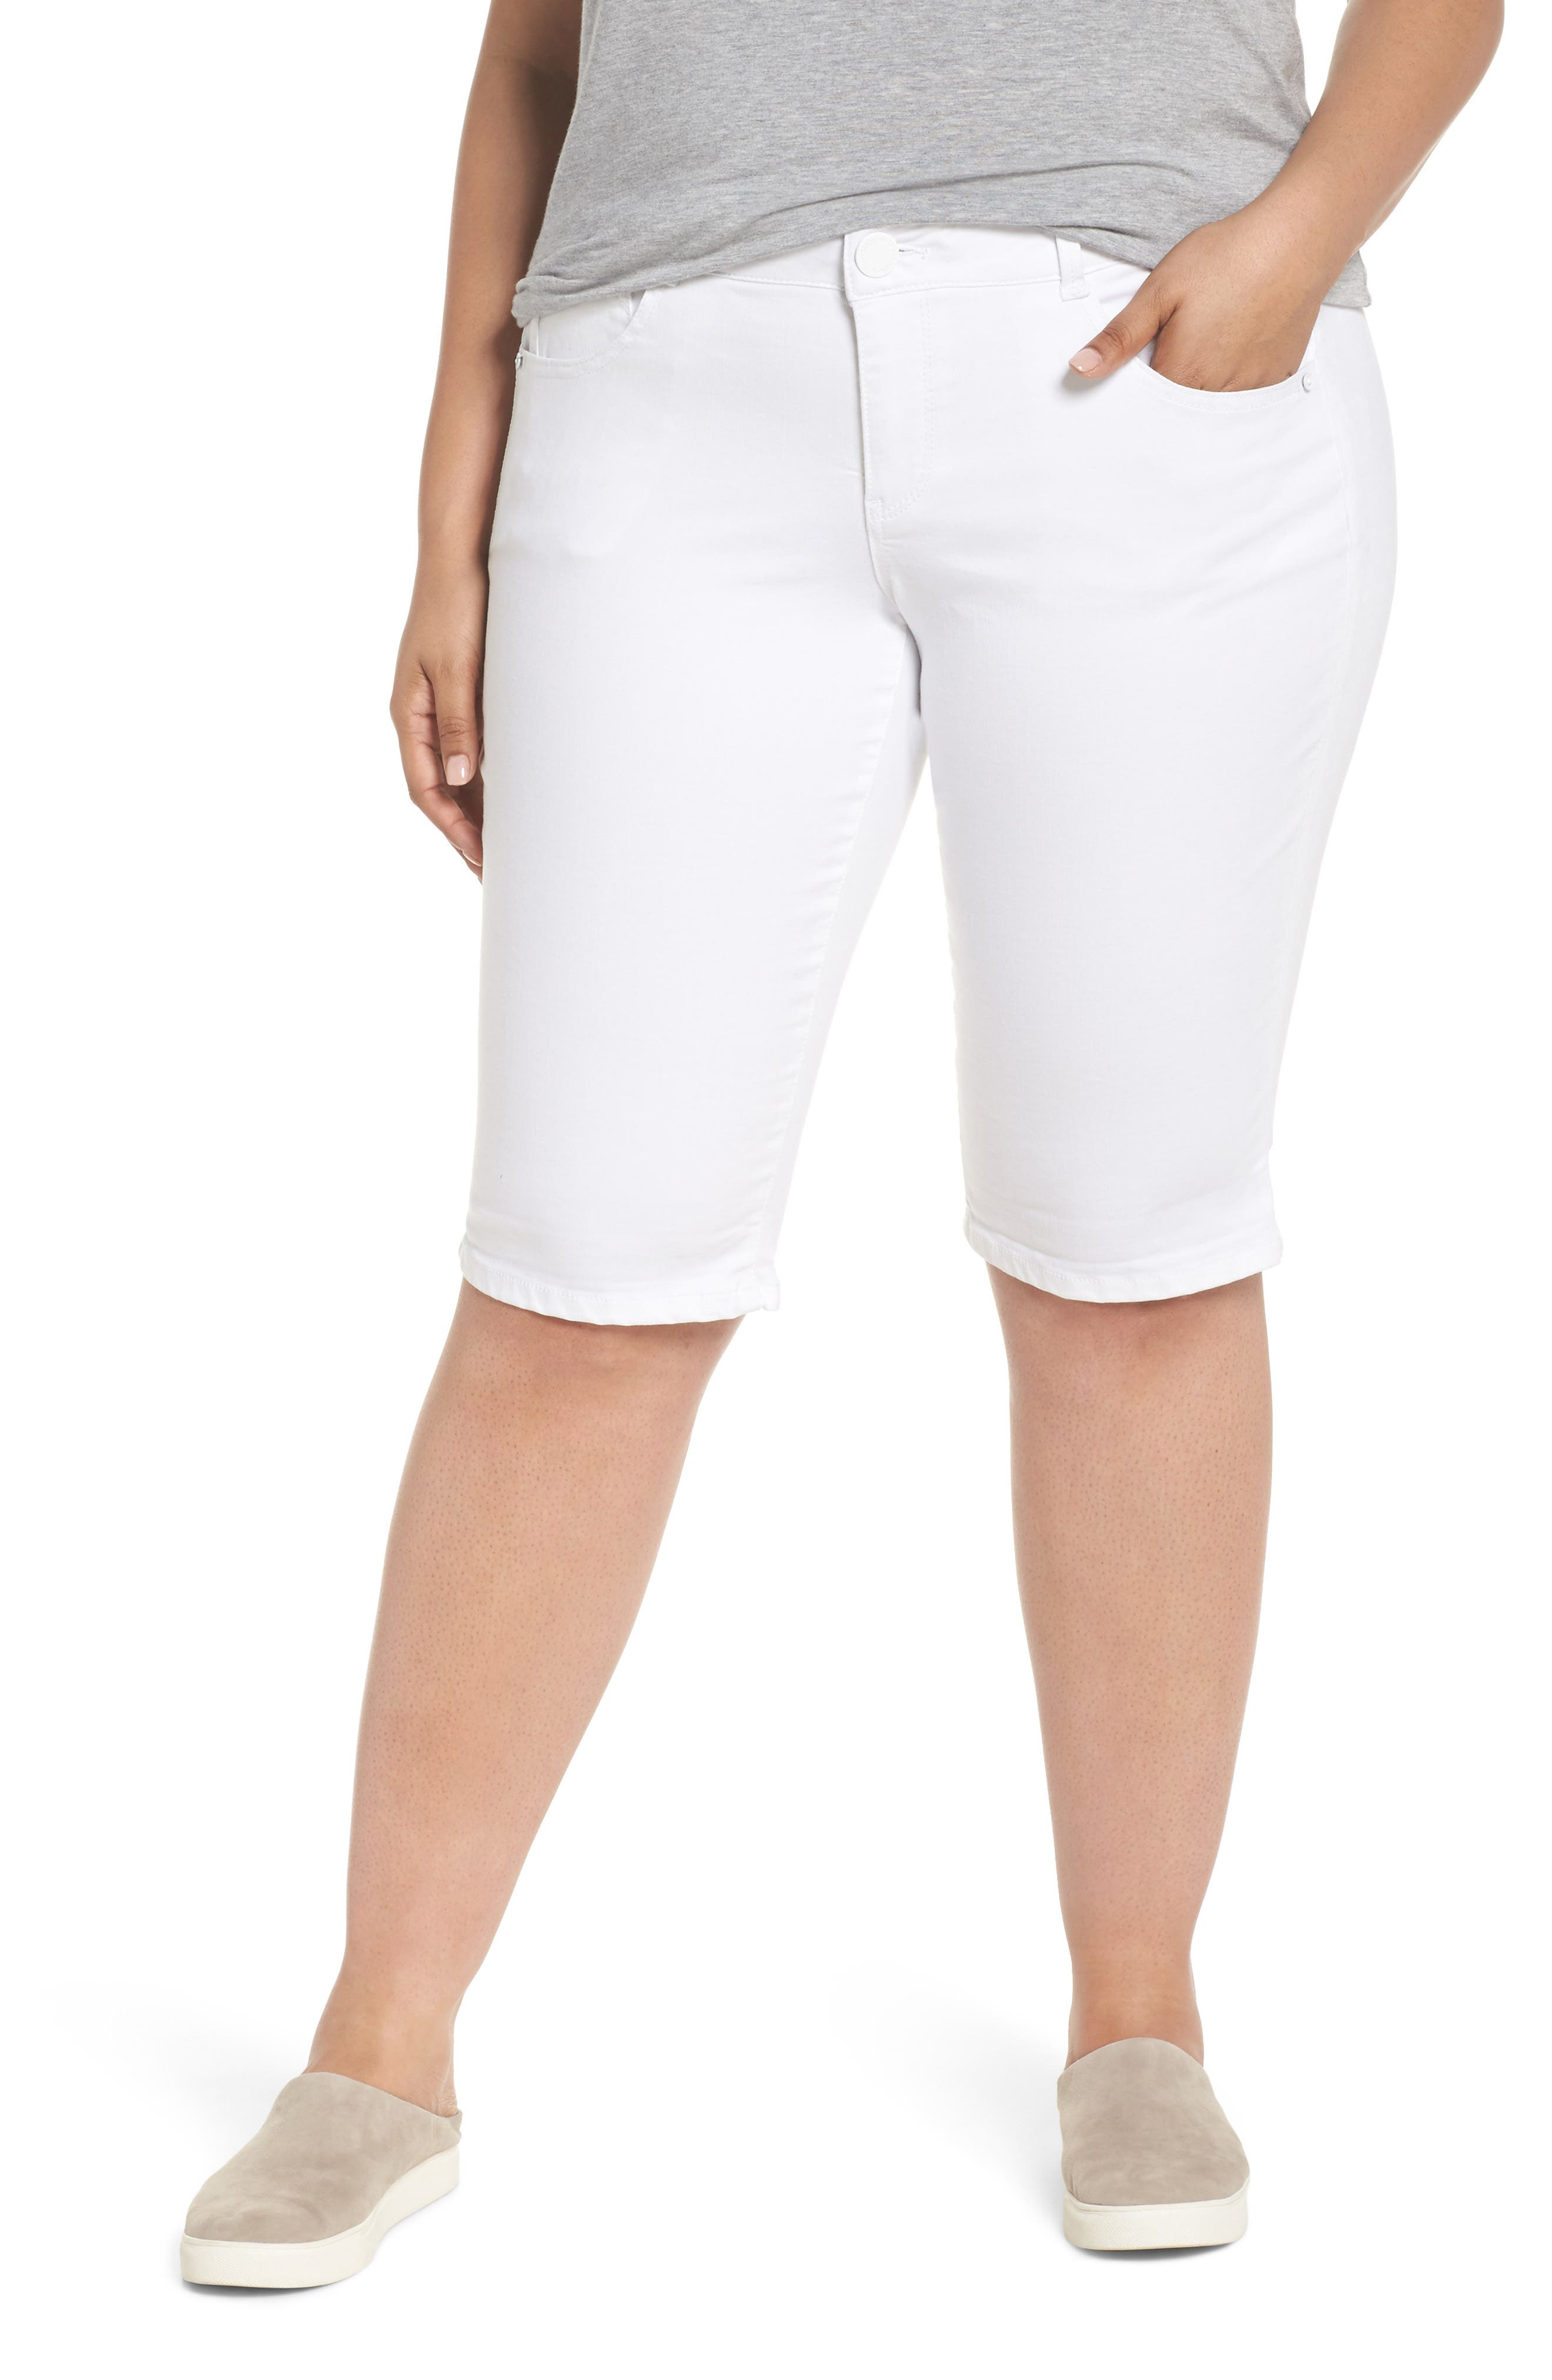 Ab-solution Bermuda Shorts,                         Main,                         color, Optic White